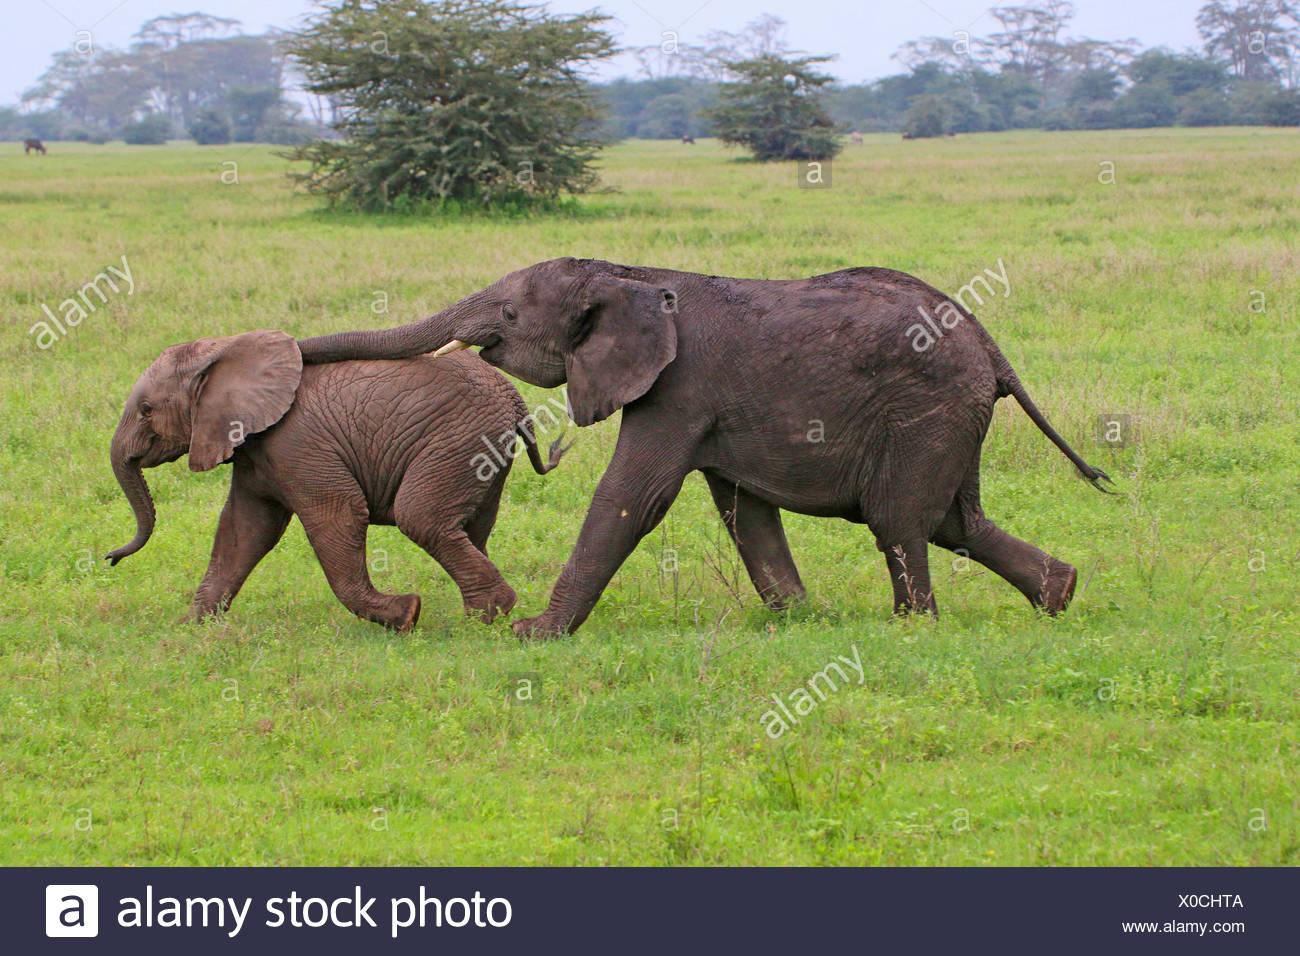 African elephant (Loxodonta africana), two playing infants, Tanzania, Serengeti National Park - Stock Image